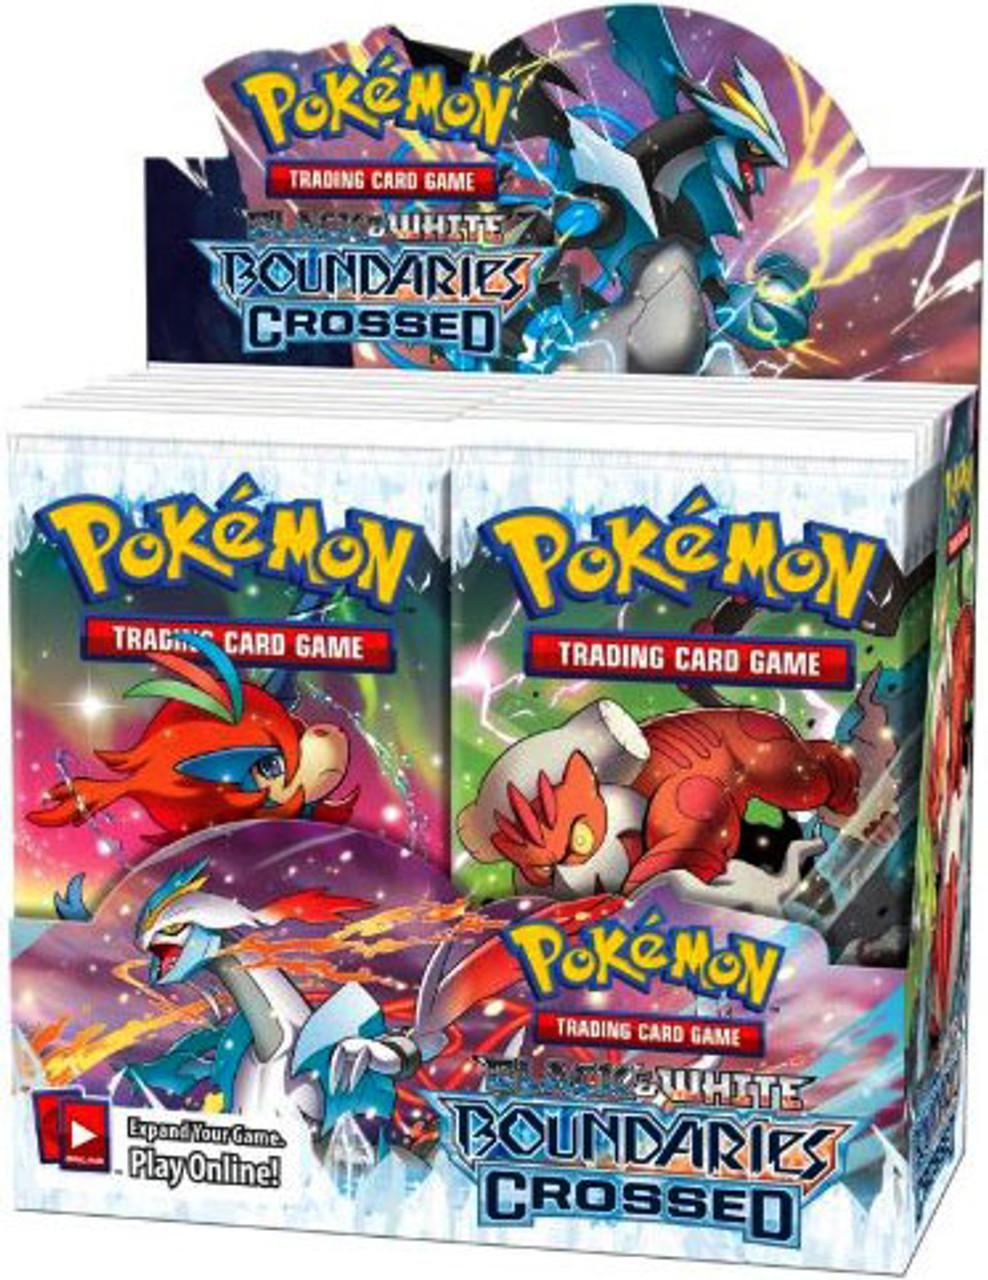 Pokemon Black & White Boundaries Crossed Booster Box [36 Packs]